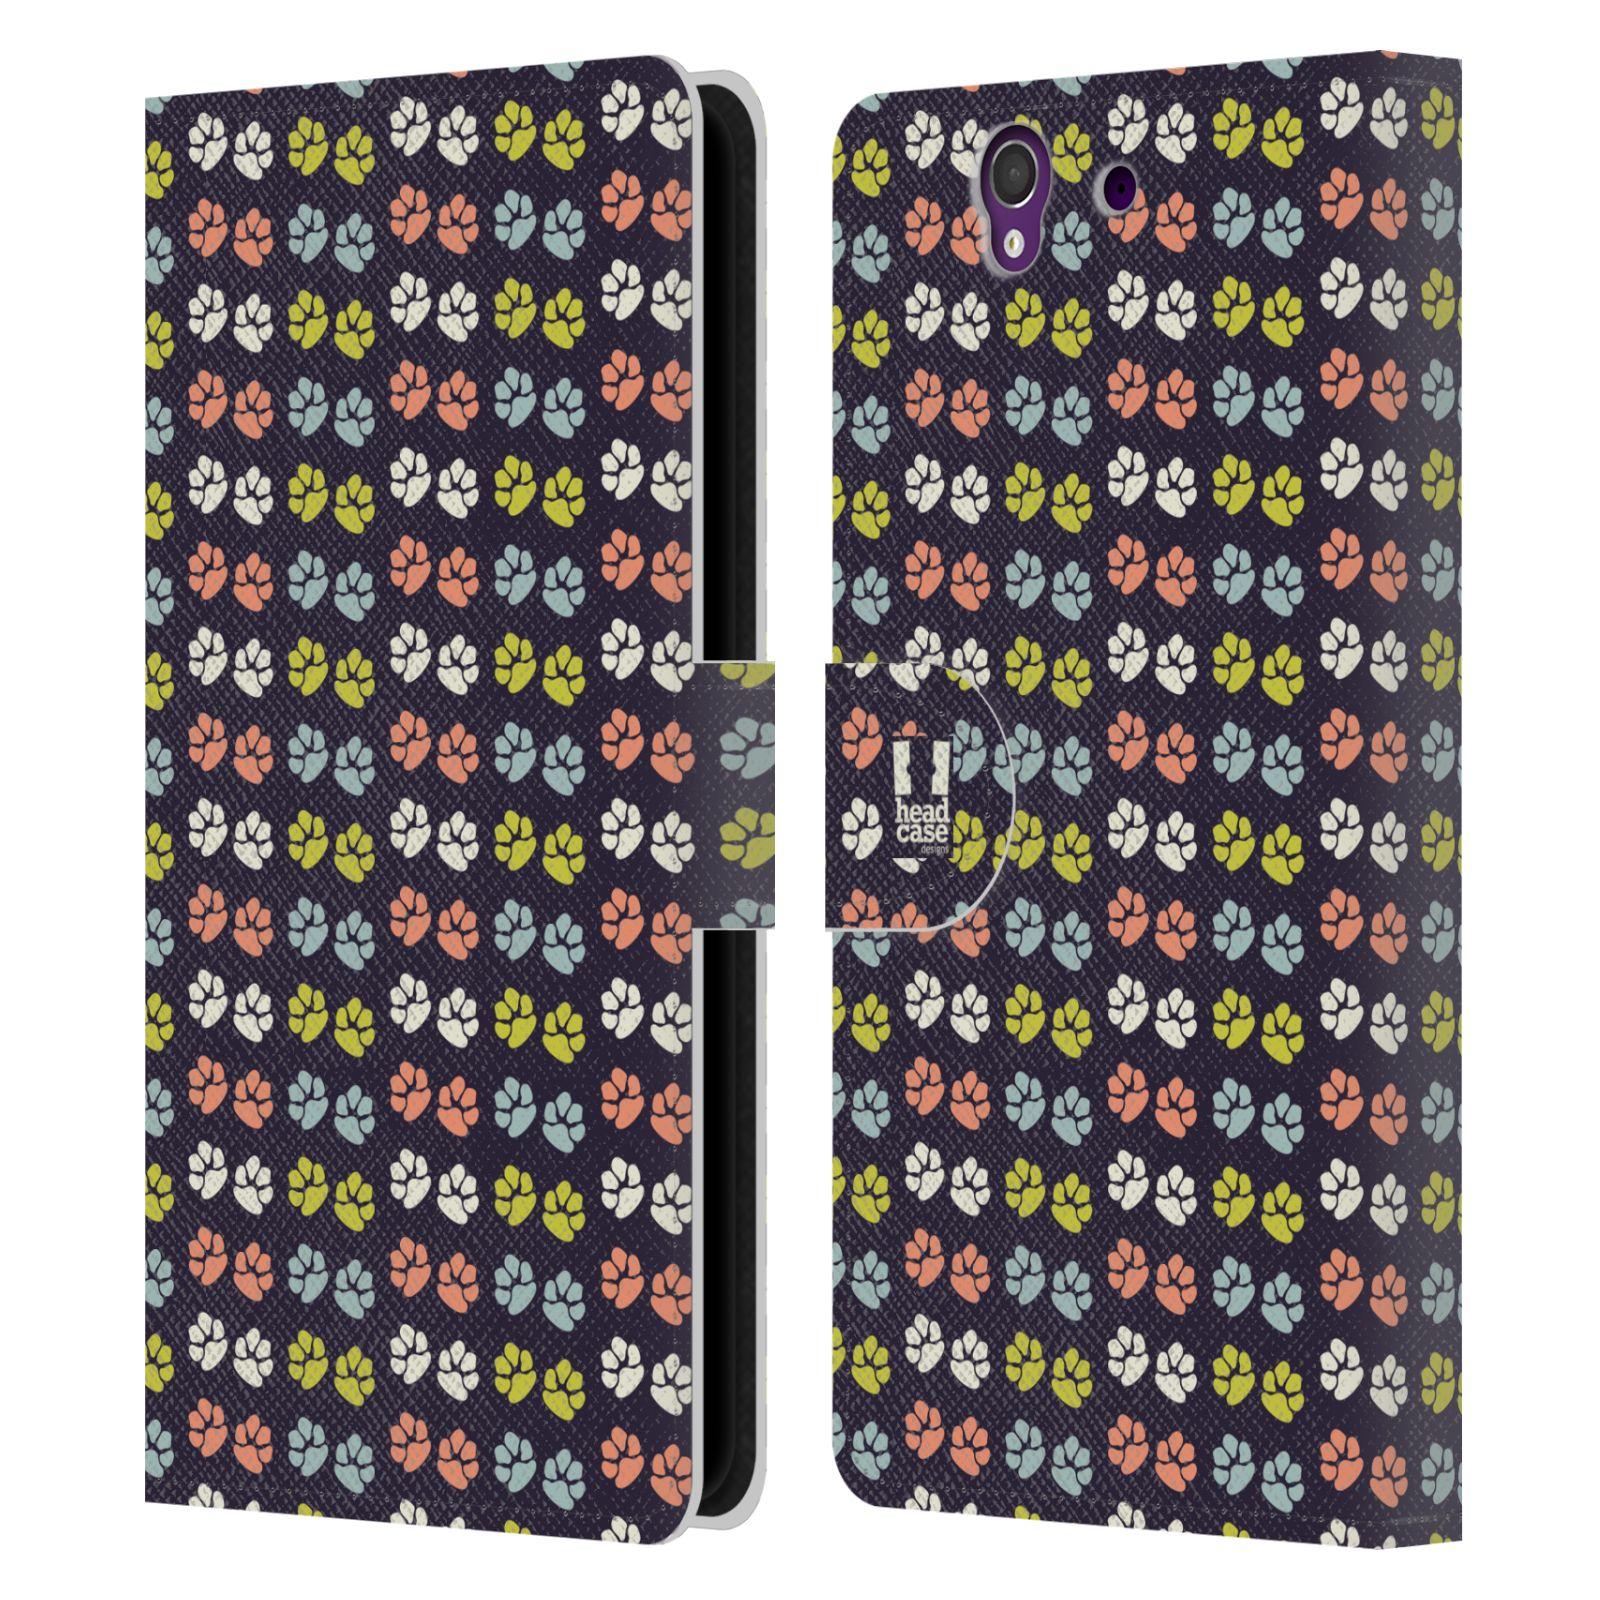 HEAD CASE Flipové pouzdro pro mobil SONY XPERIA Z (C6603) Pejsek ťapky barevné RETRO